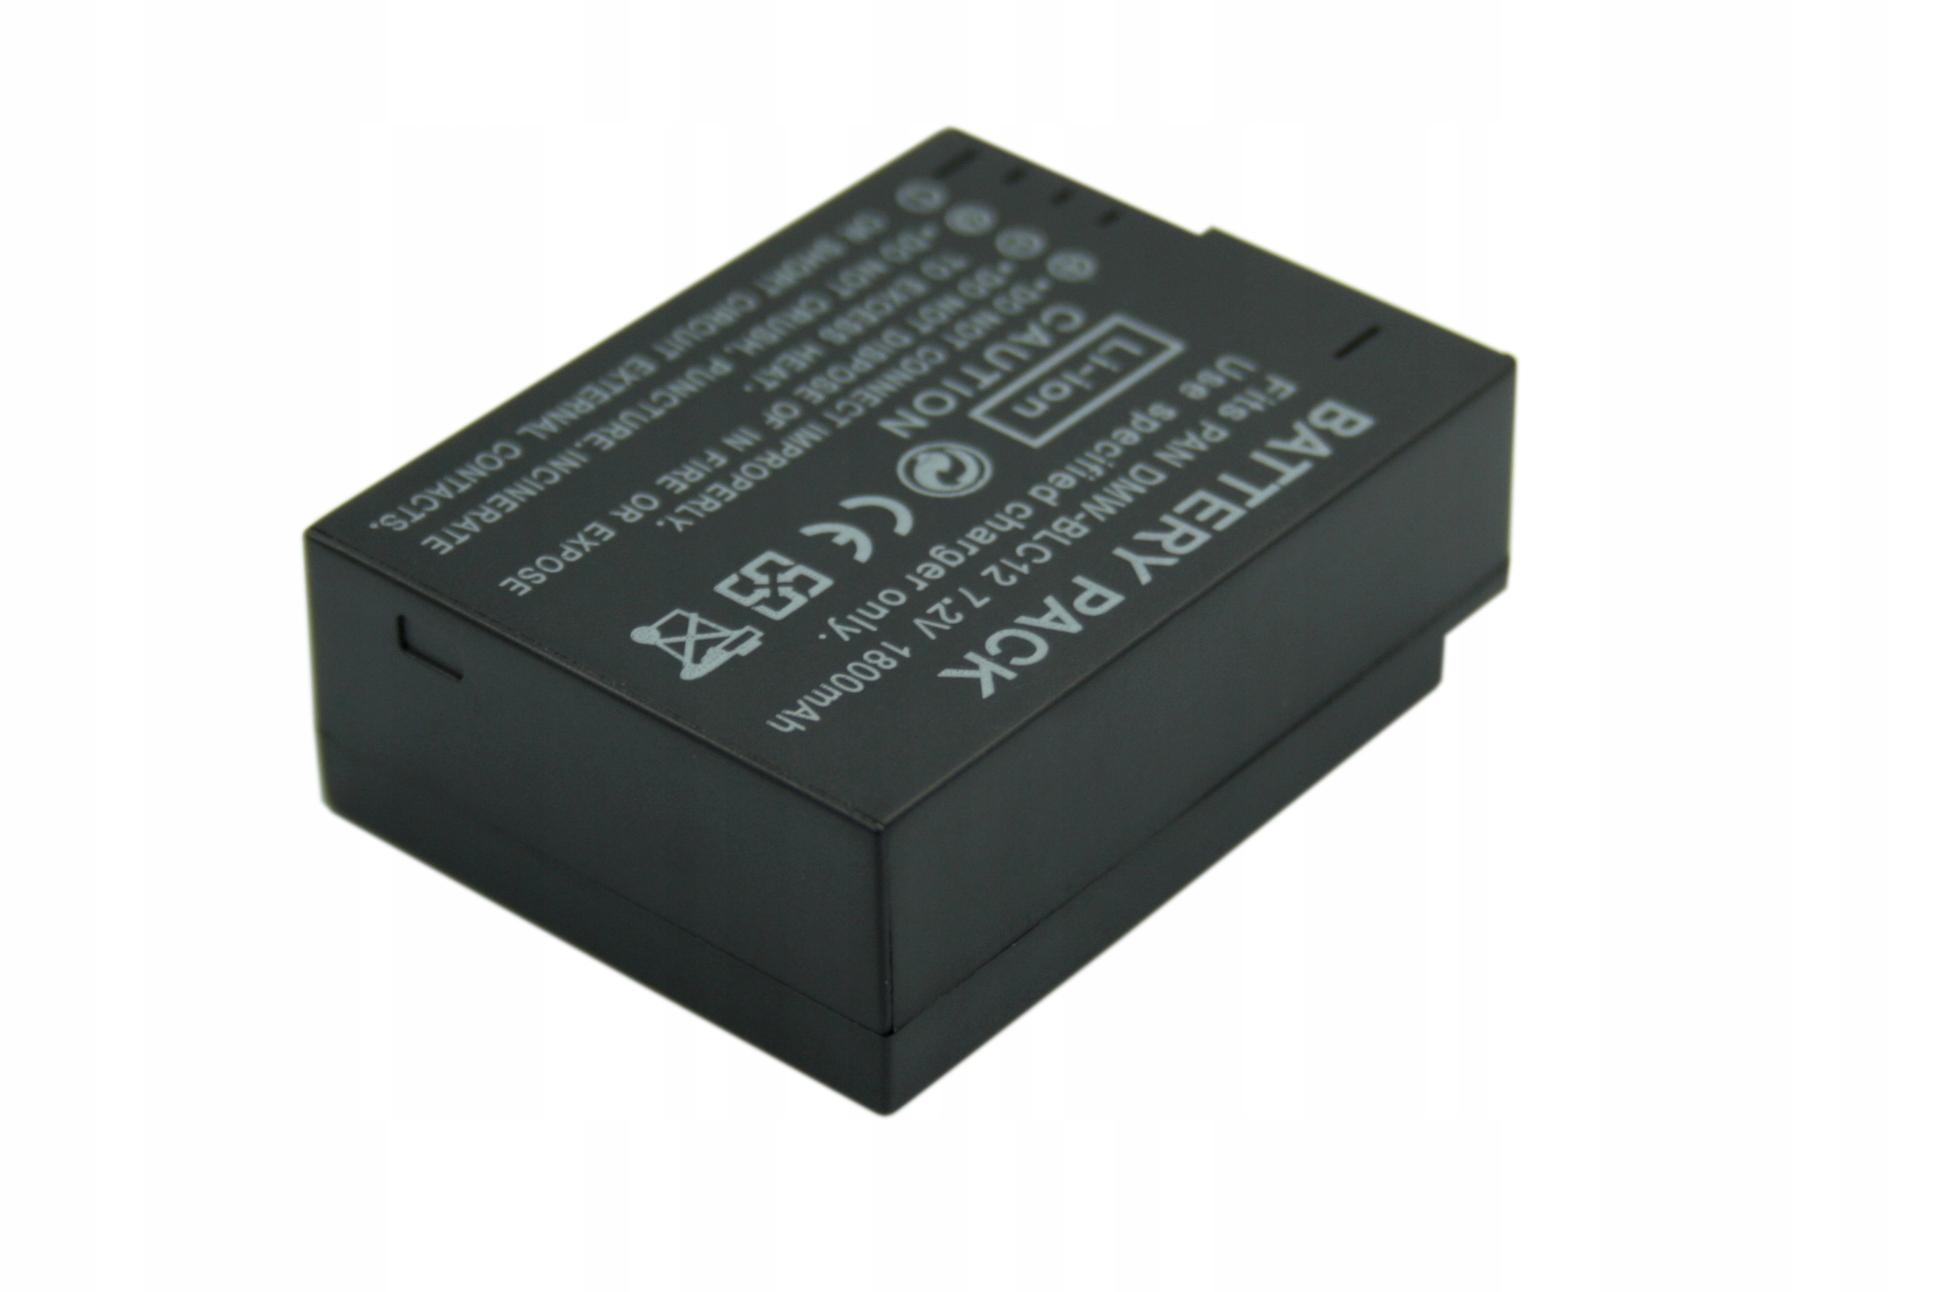 BATERIA AKUMULATOR PANASONIC LUMIX DMC-G5 DMC-G6 - Baterie do aparatów cyfrowych